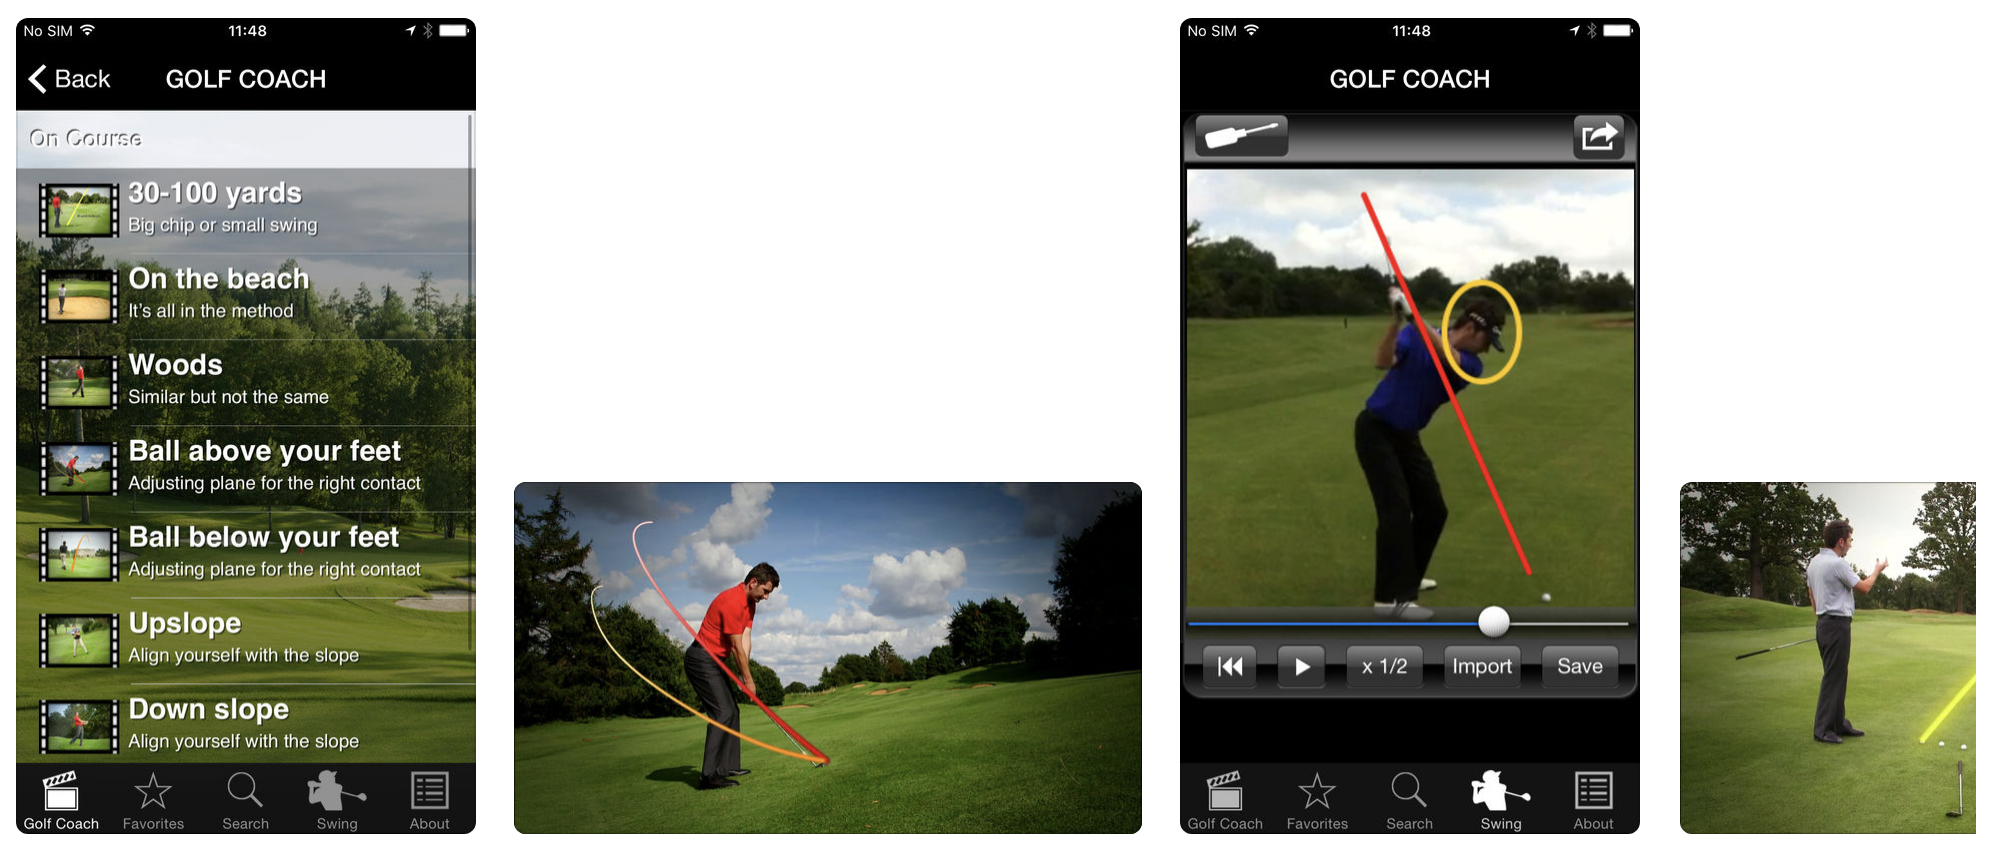 Golf Coach App